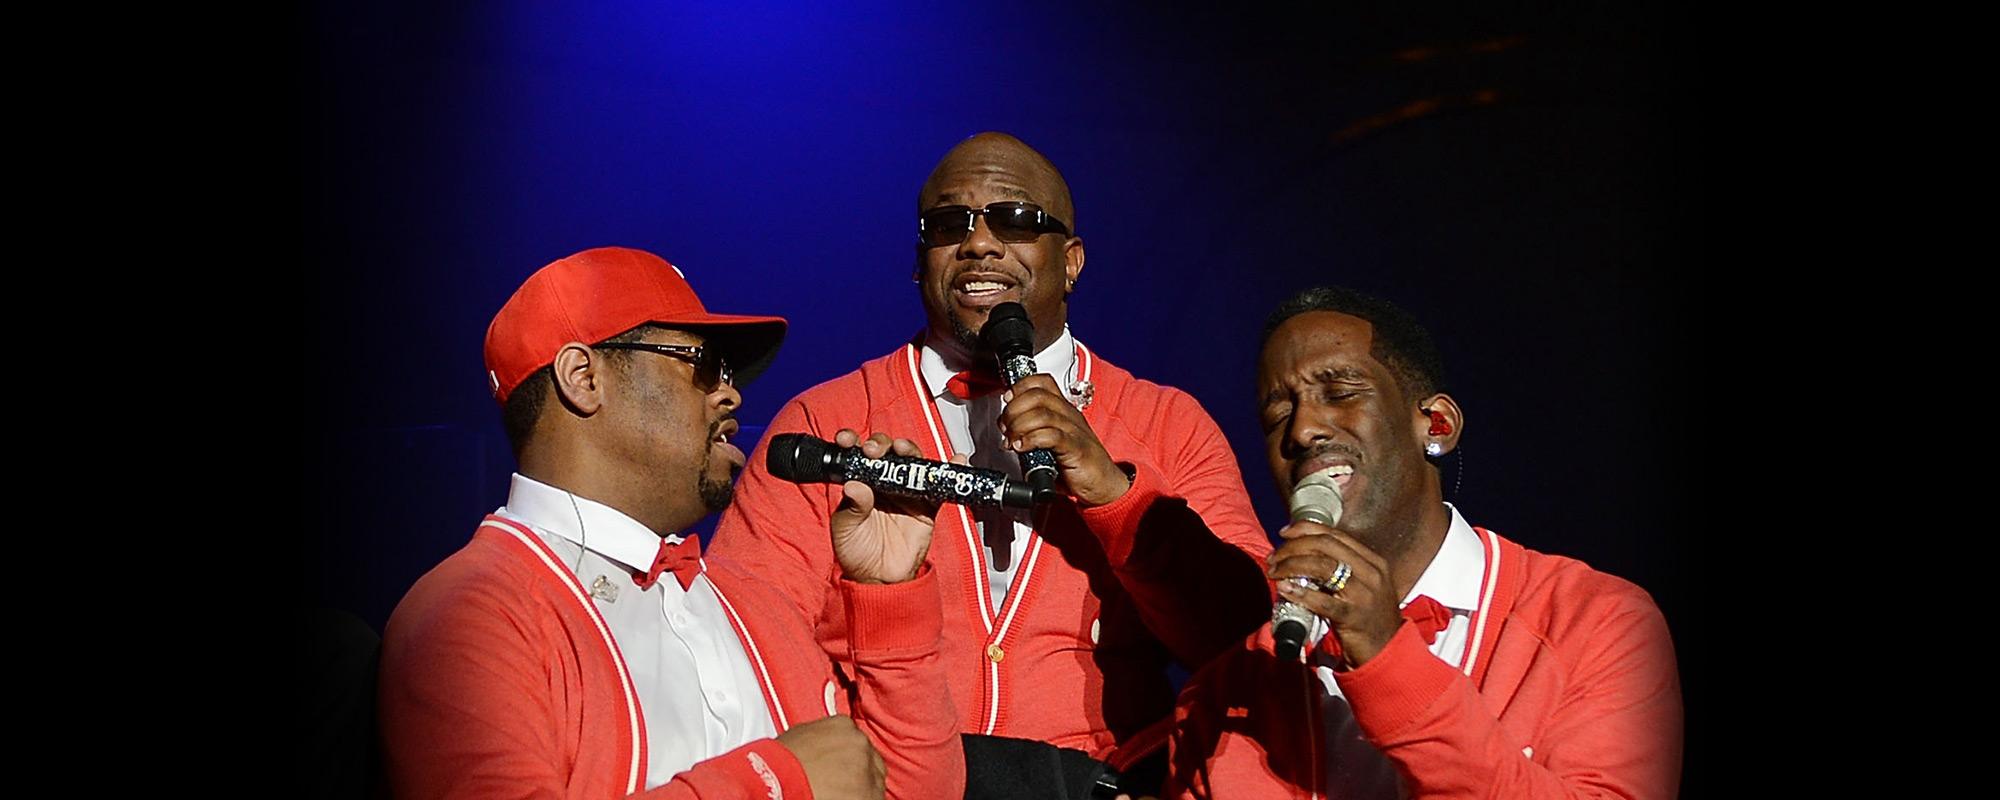 Boyz II Men Show Las Vegas: Tickets & Reviews | Vegas com